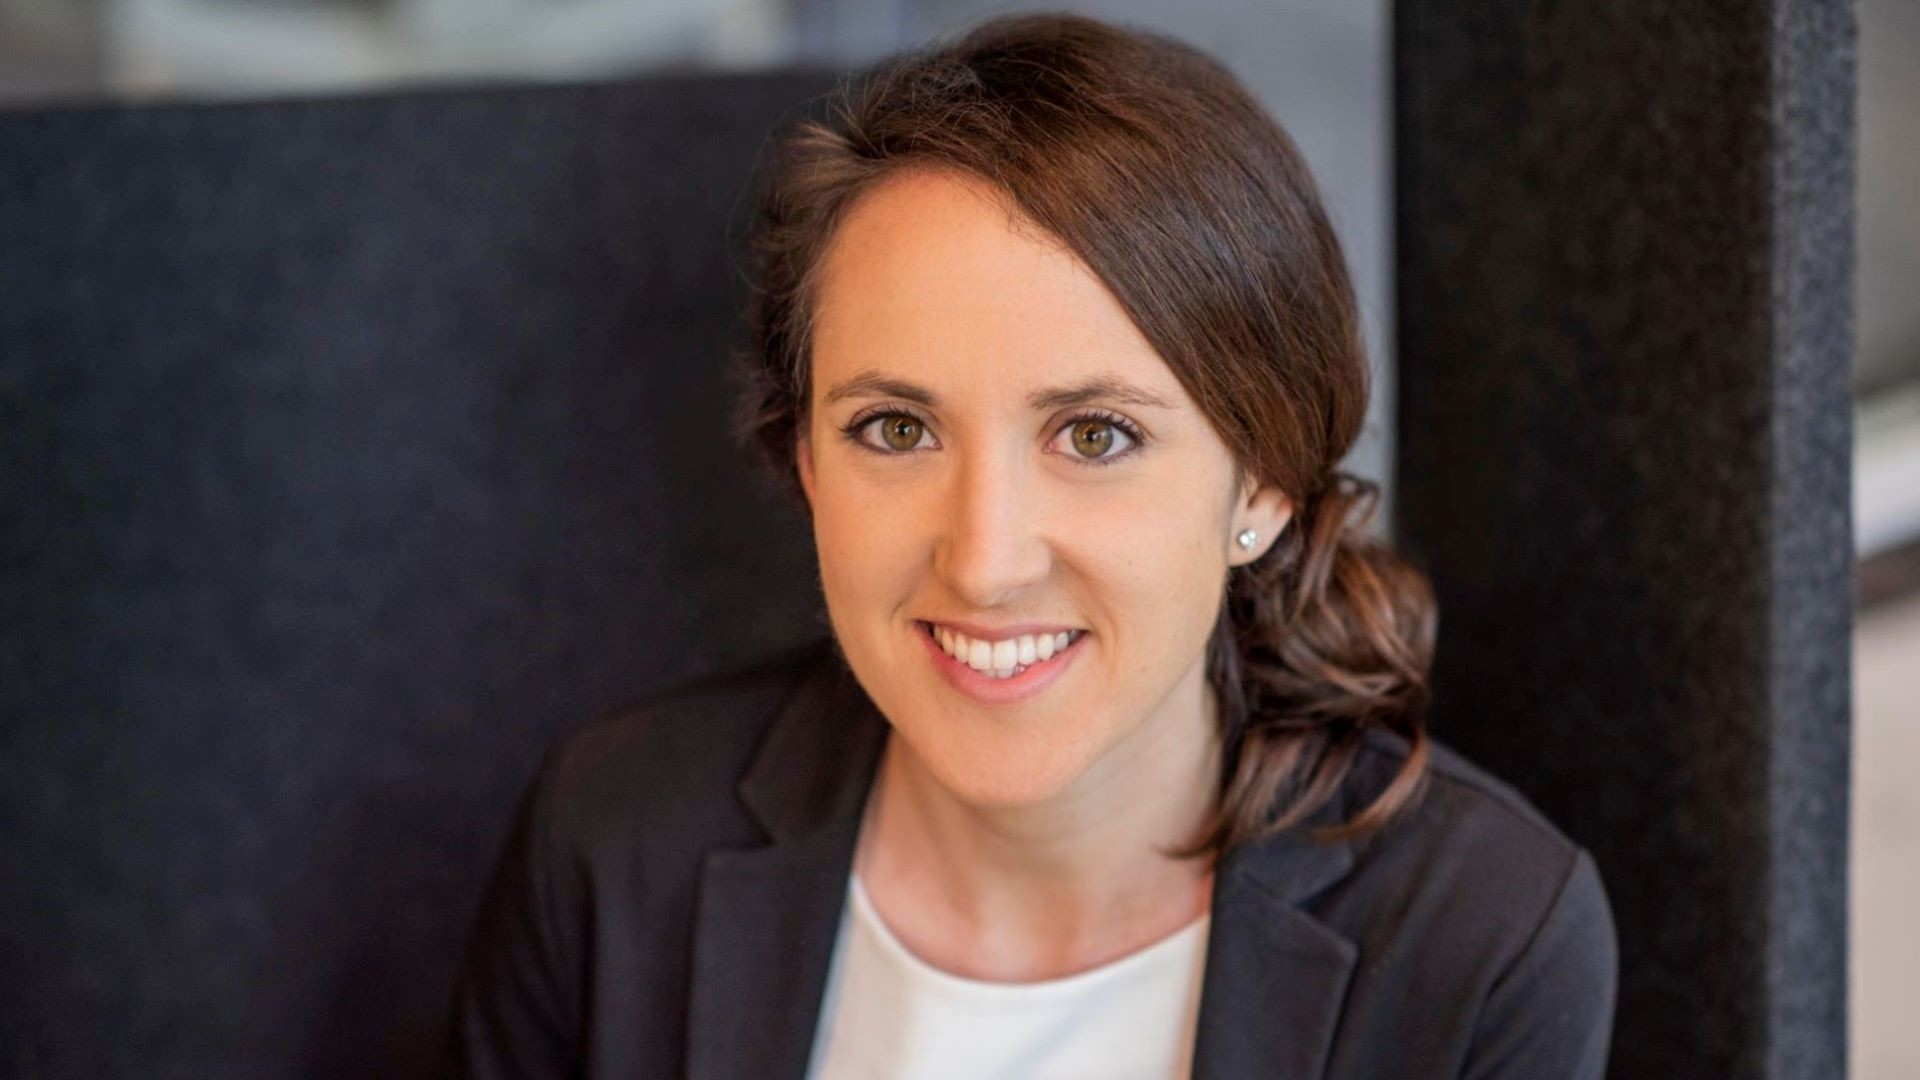 Marta Sainz, Digital Manager